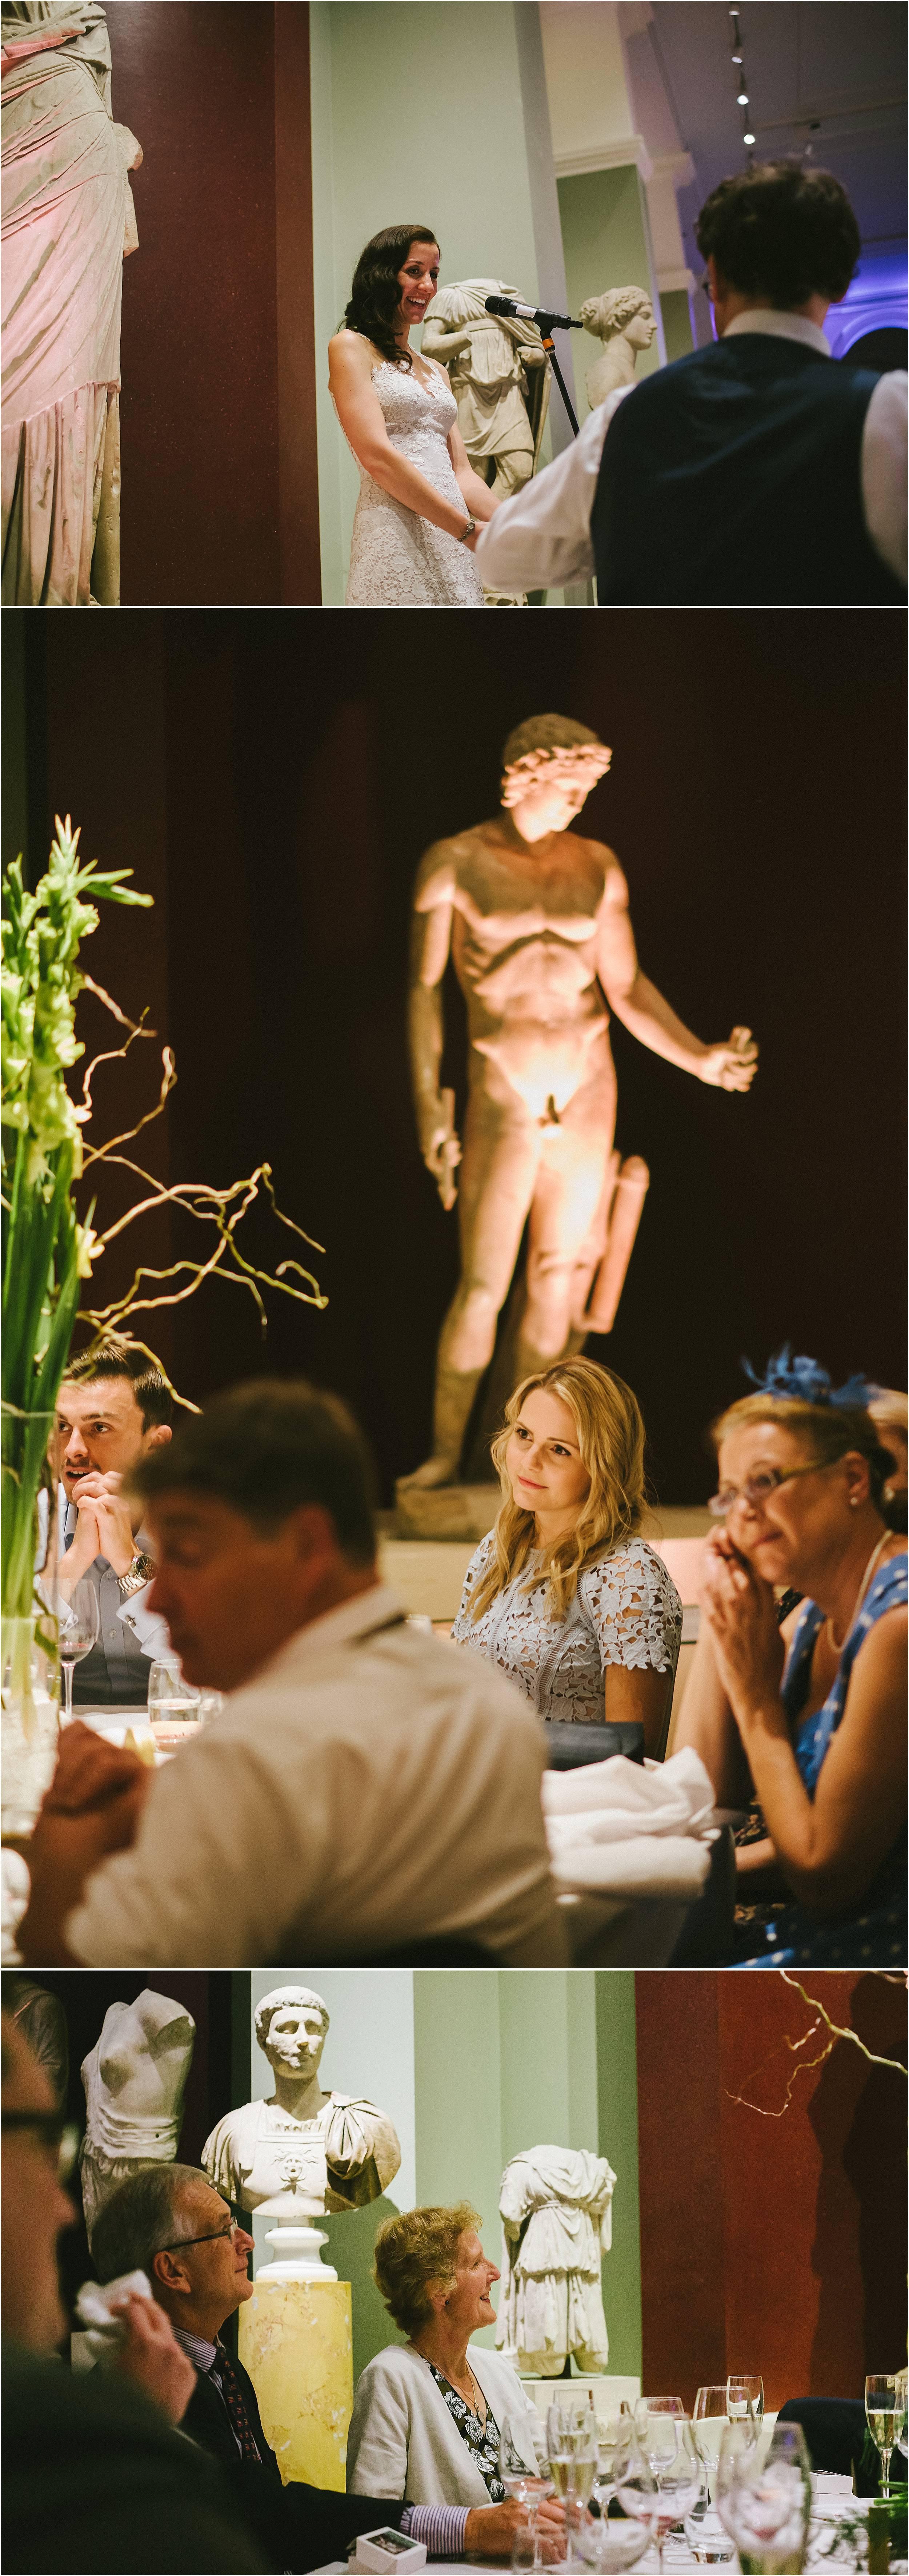 Oxford Ashmolean Museum Wedding Photography_0148.jpg